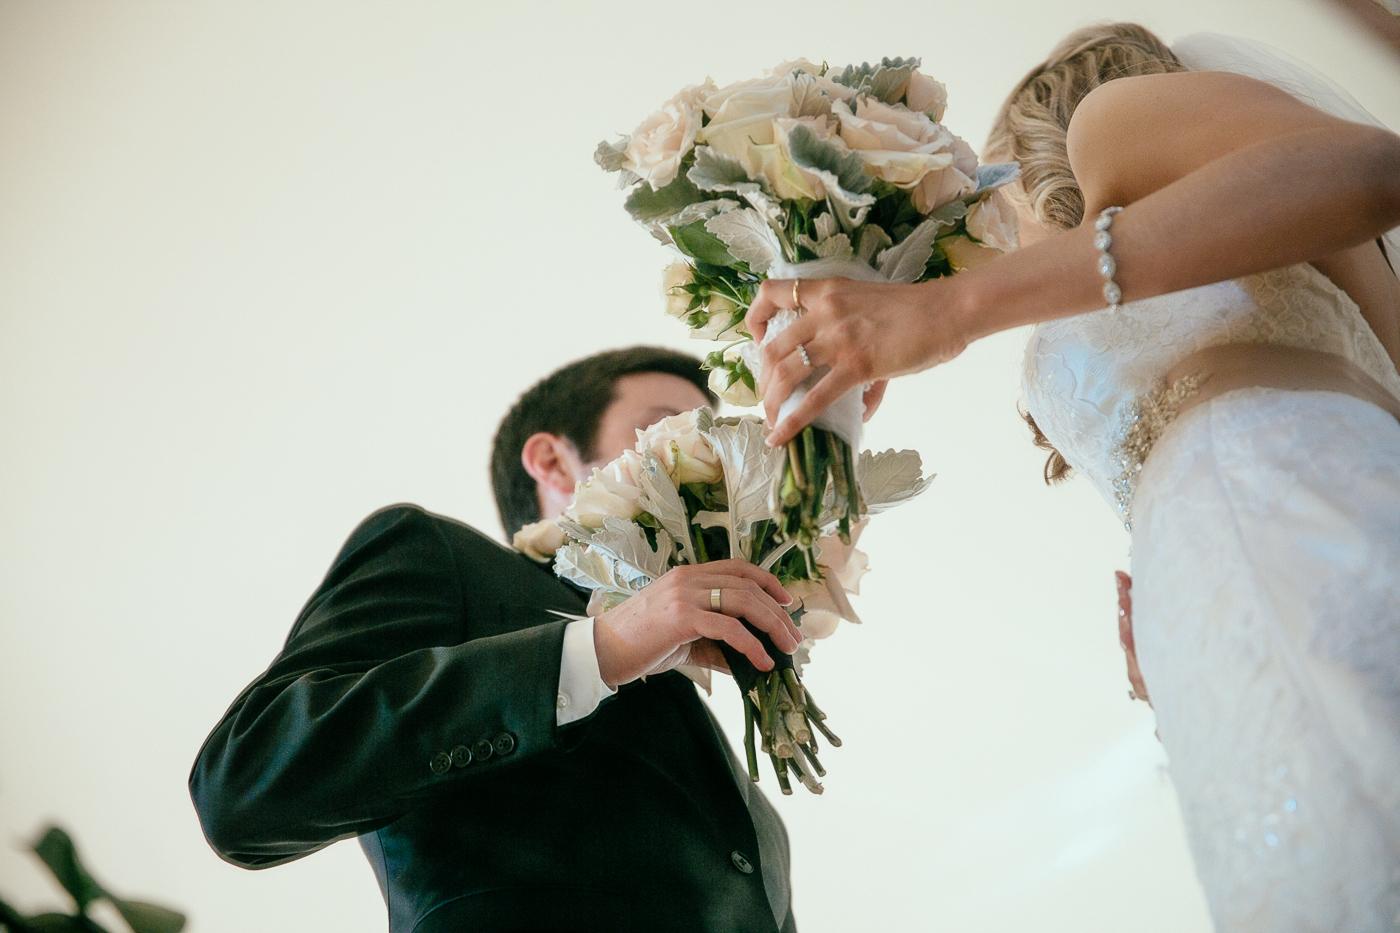 RYAN_&_KELLEY_DARLINGTON_HOUSE_WEDDING_2014_7X9A2198.JPG